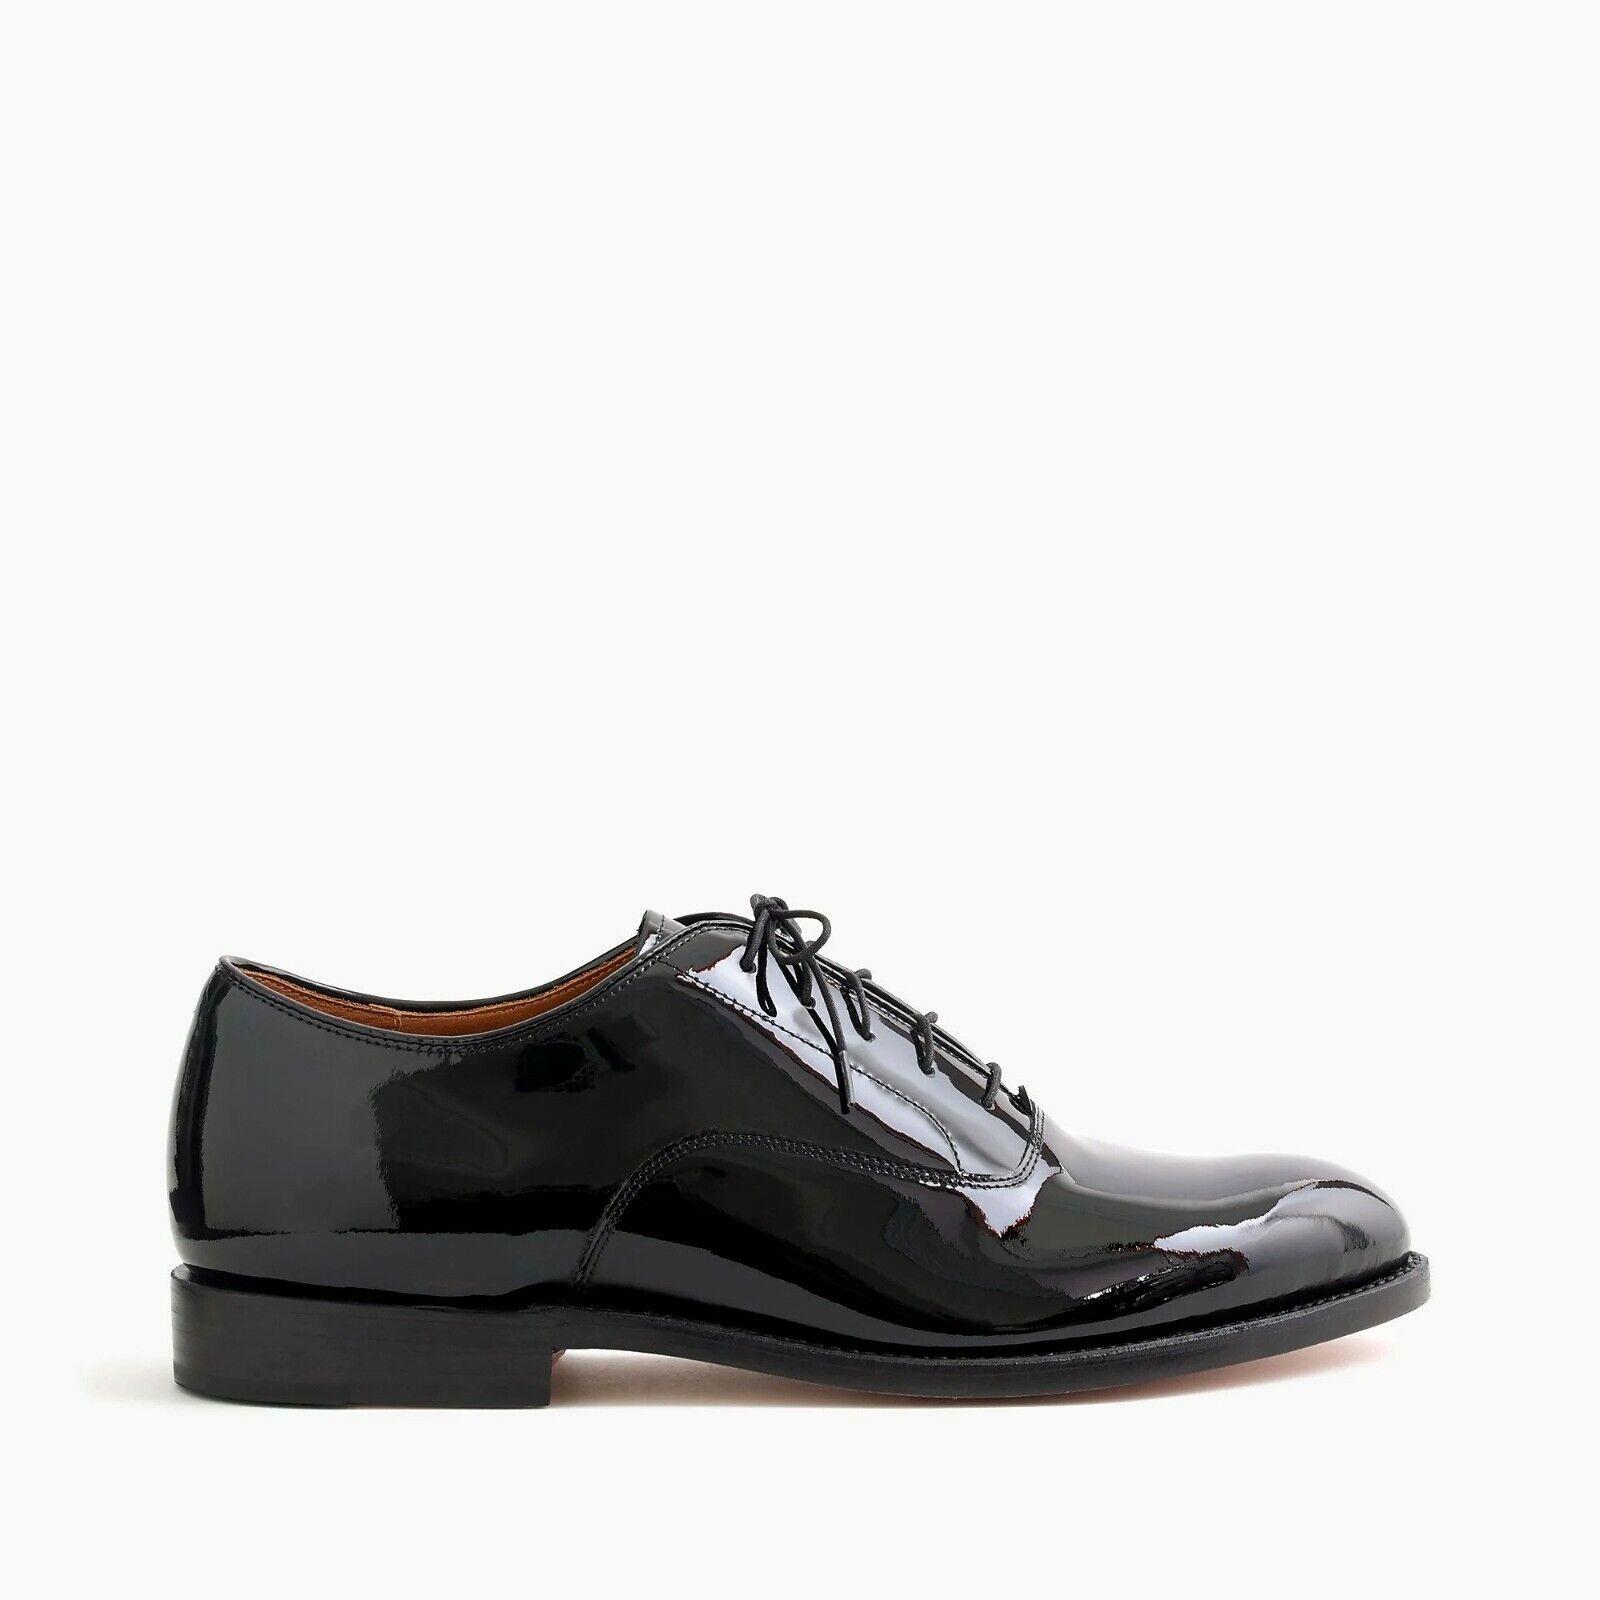 J. Crew Mens Ludlow Balmoral Tuxedo Dress shoes Black Formal Sz 12 orig  298 NIB